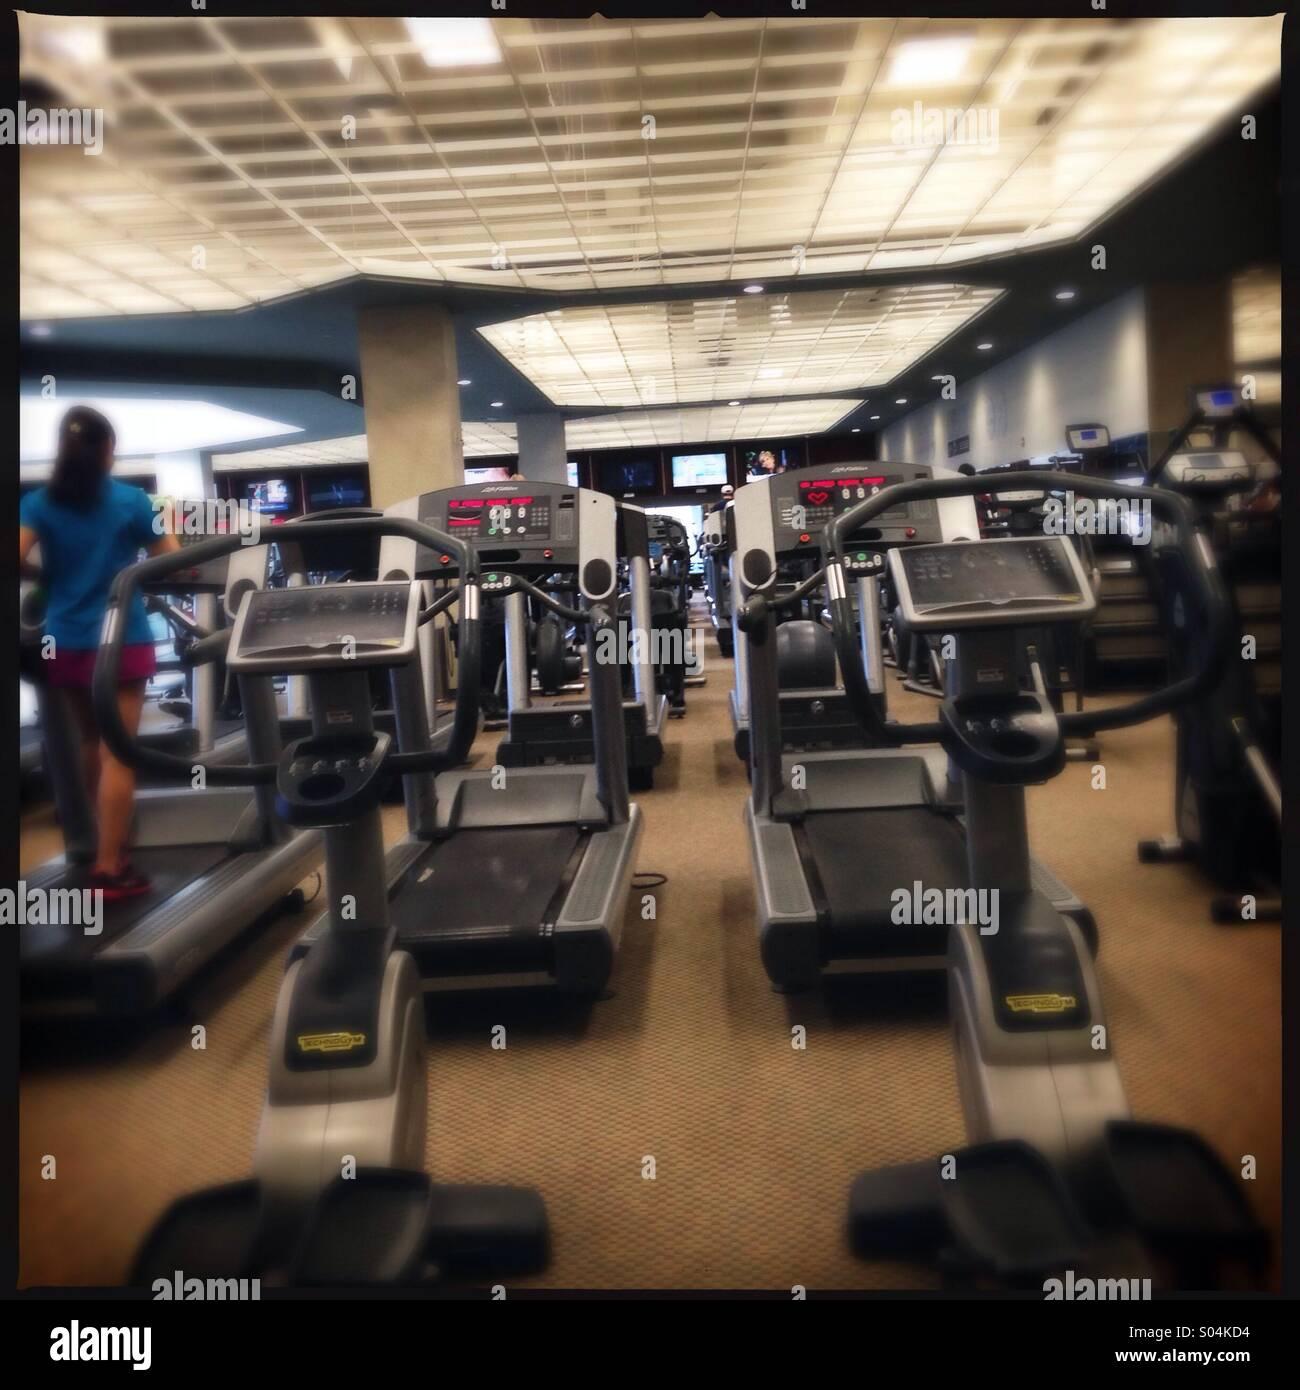 Gym - Stock Image